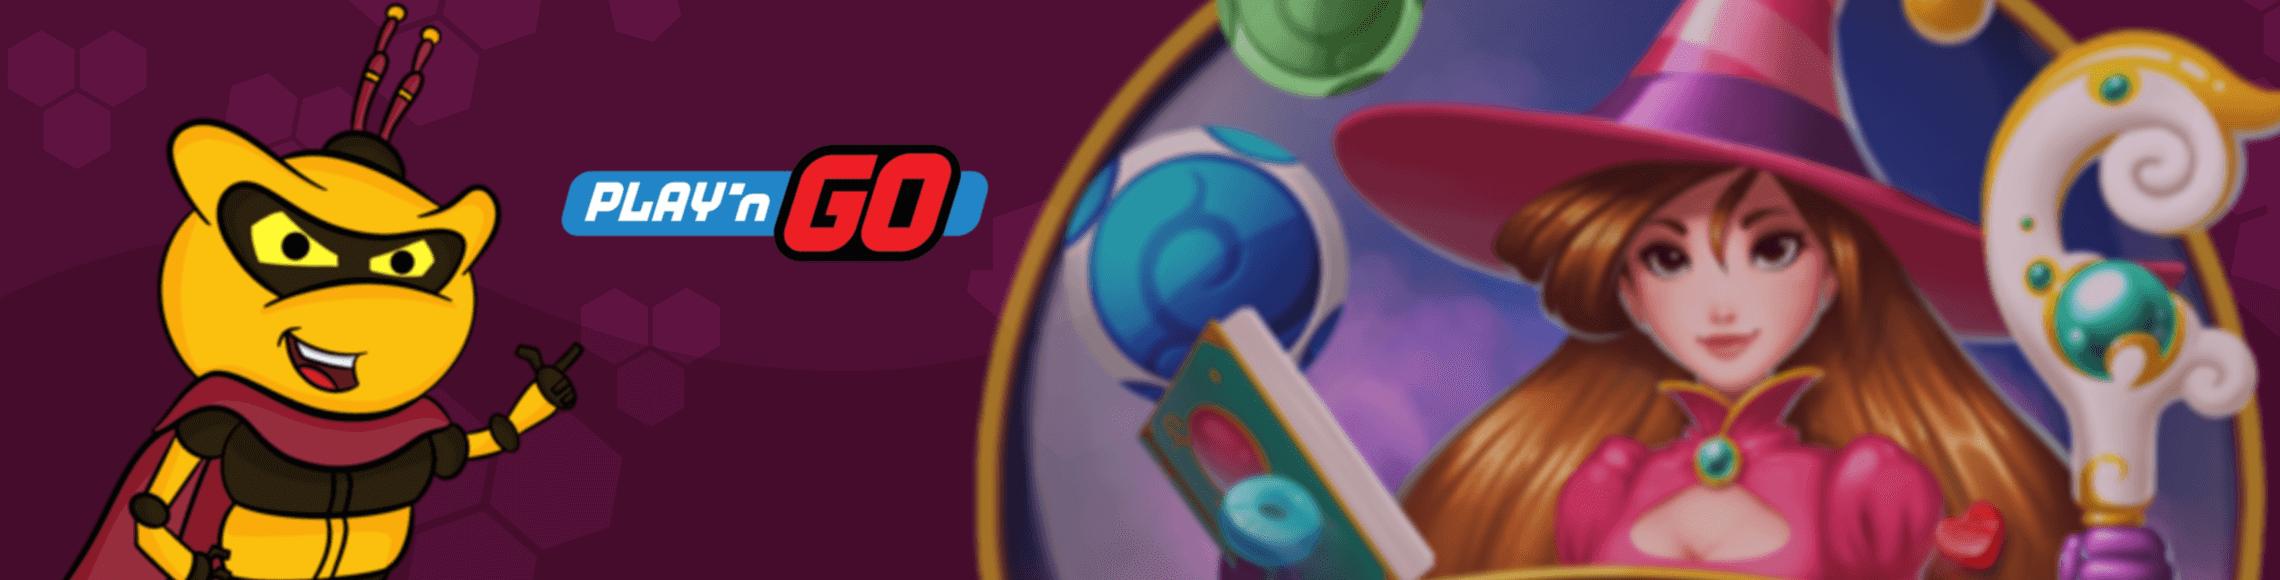 Playn GO winner casino 57051